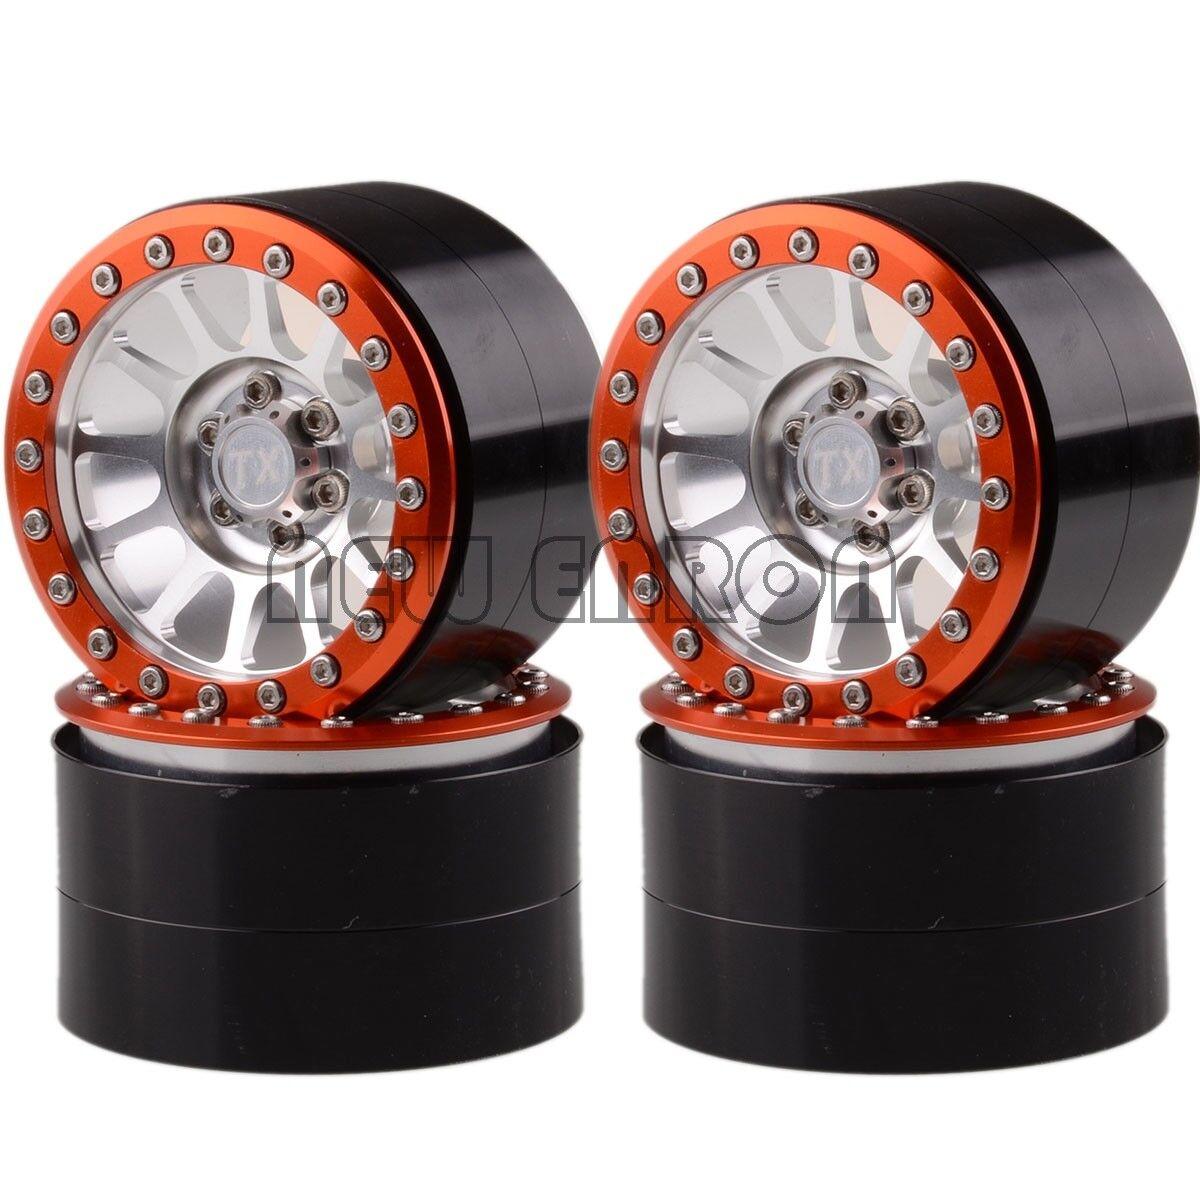 4PCS in tuttiuminio 12 12 12 Raggi Lega Ruote 2.2  per Assiale Yeti Wraith Crawler RC fd166b